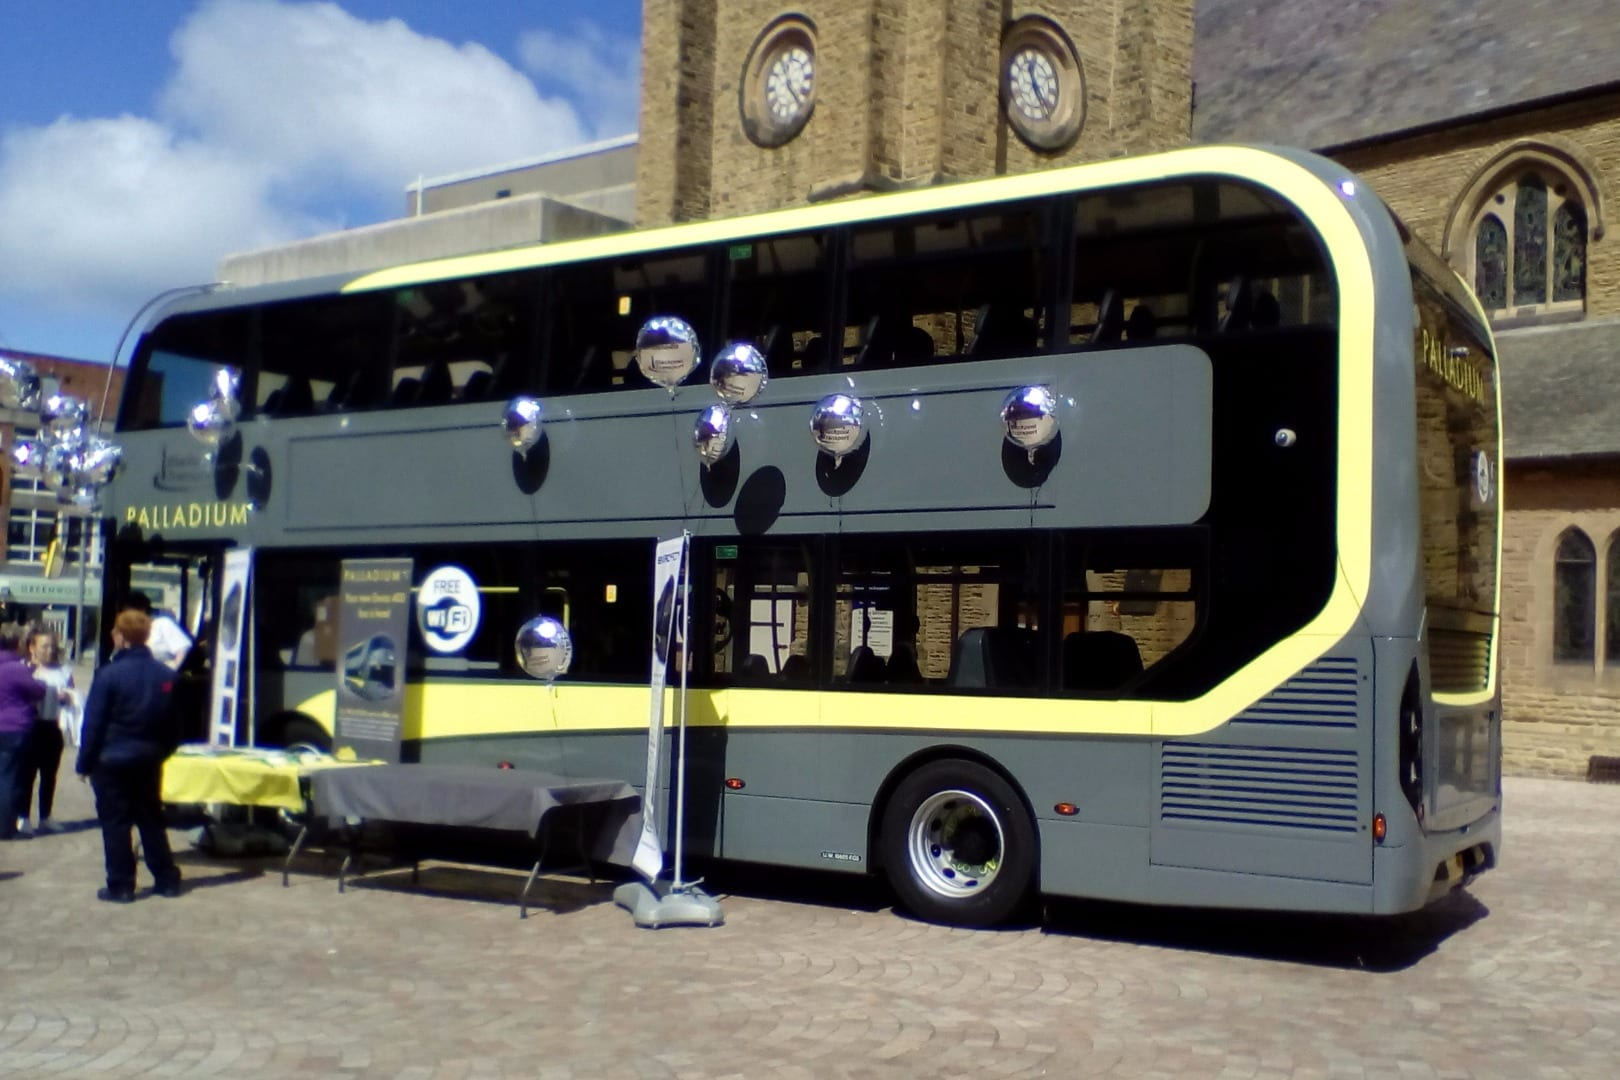 New Blackpool Transport Palladium double decker bus